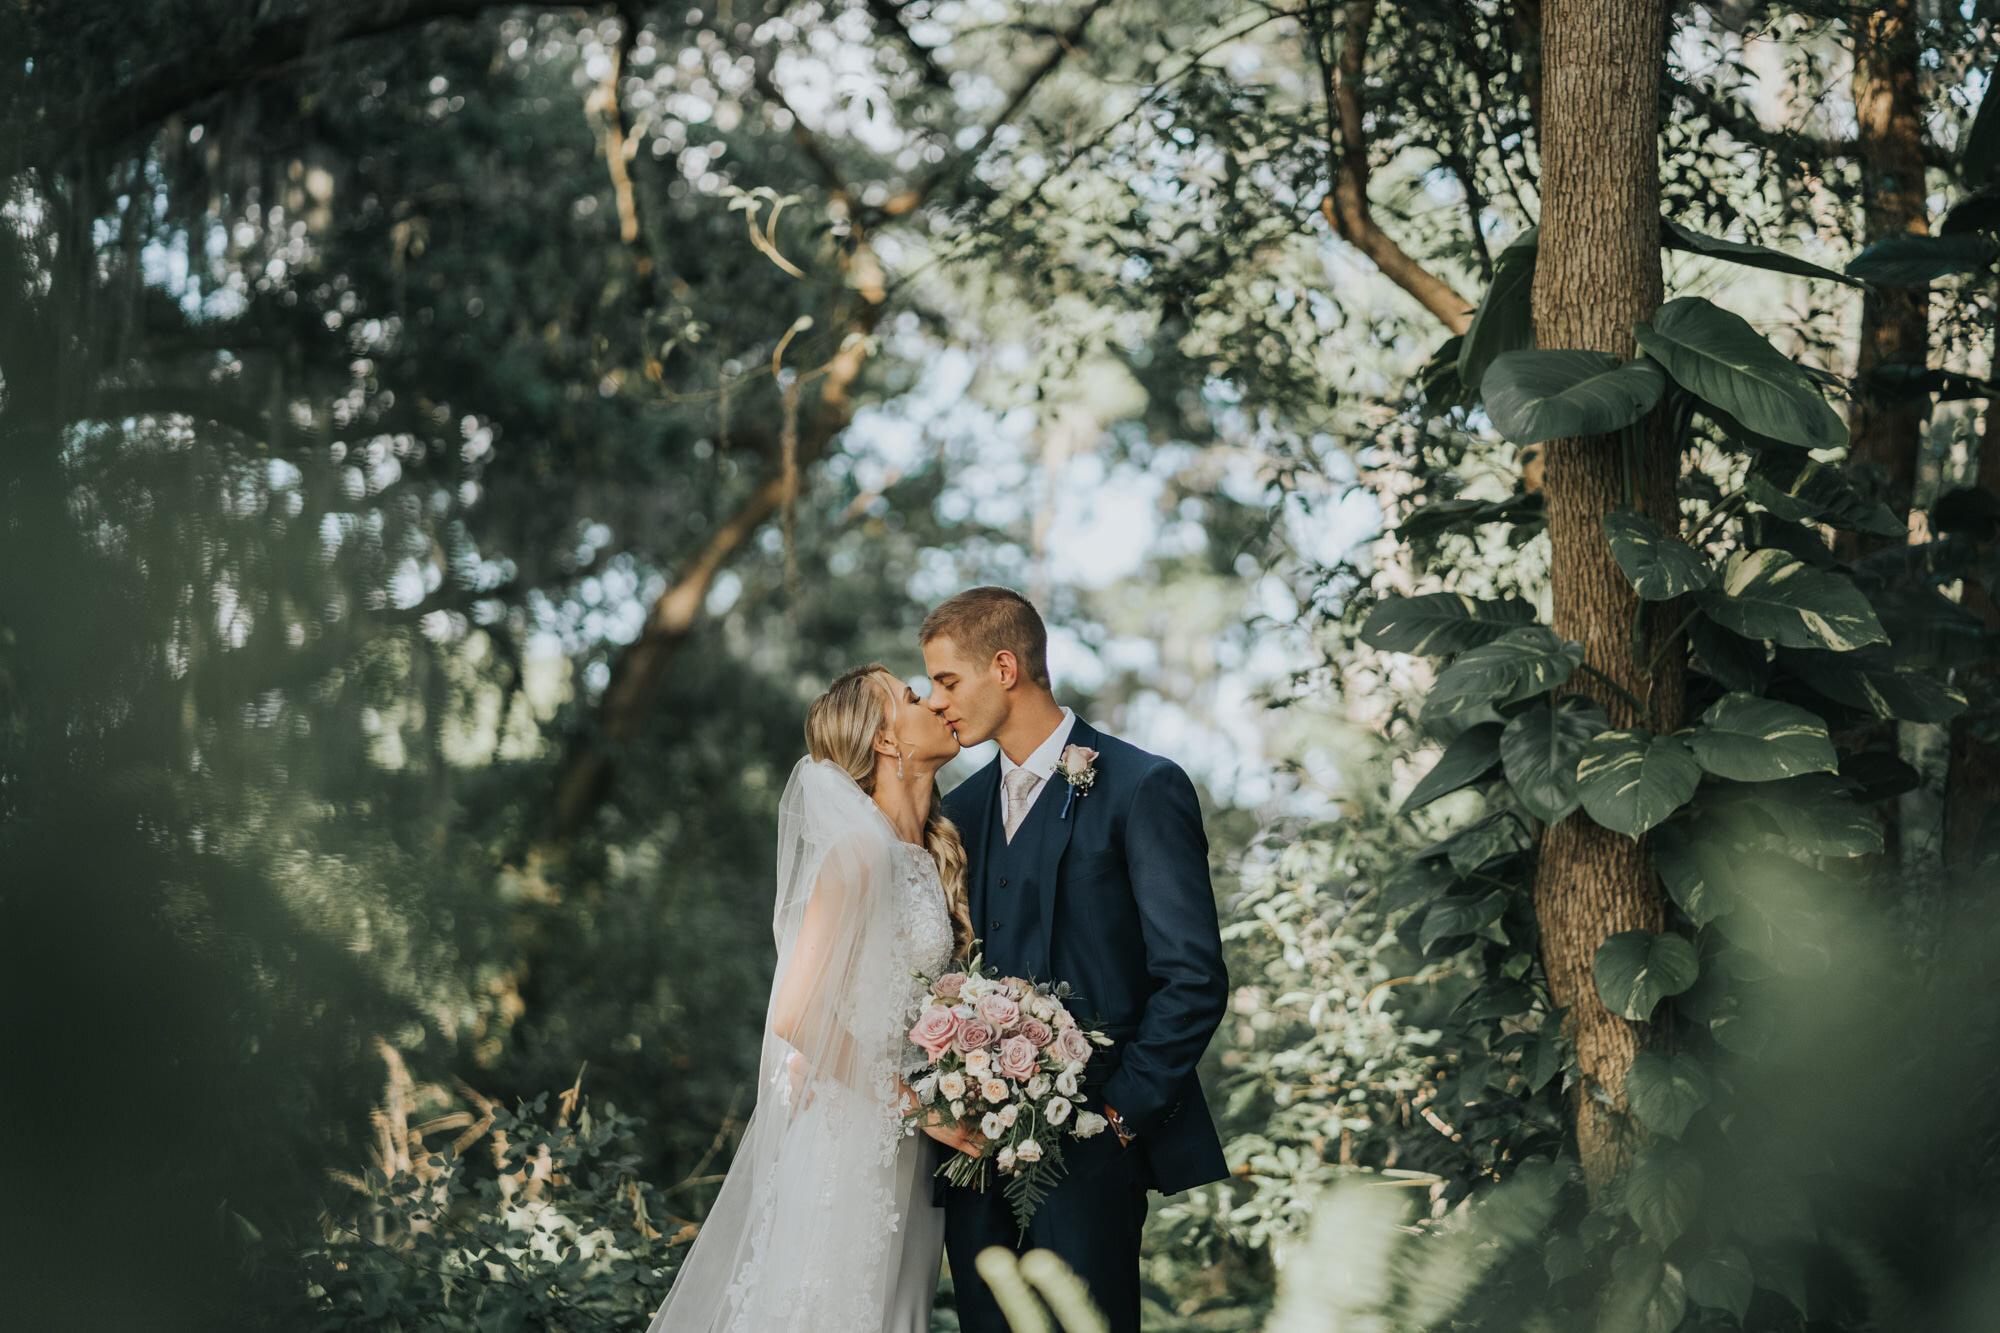 330Sean_Emily_Wedding_3-30-19.jpg